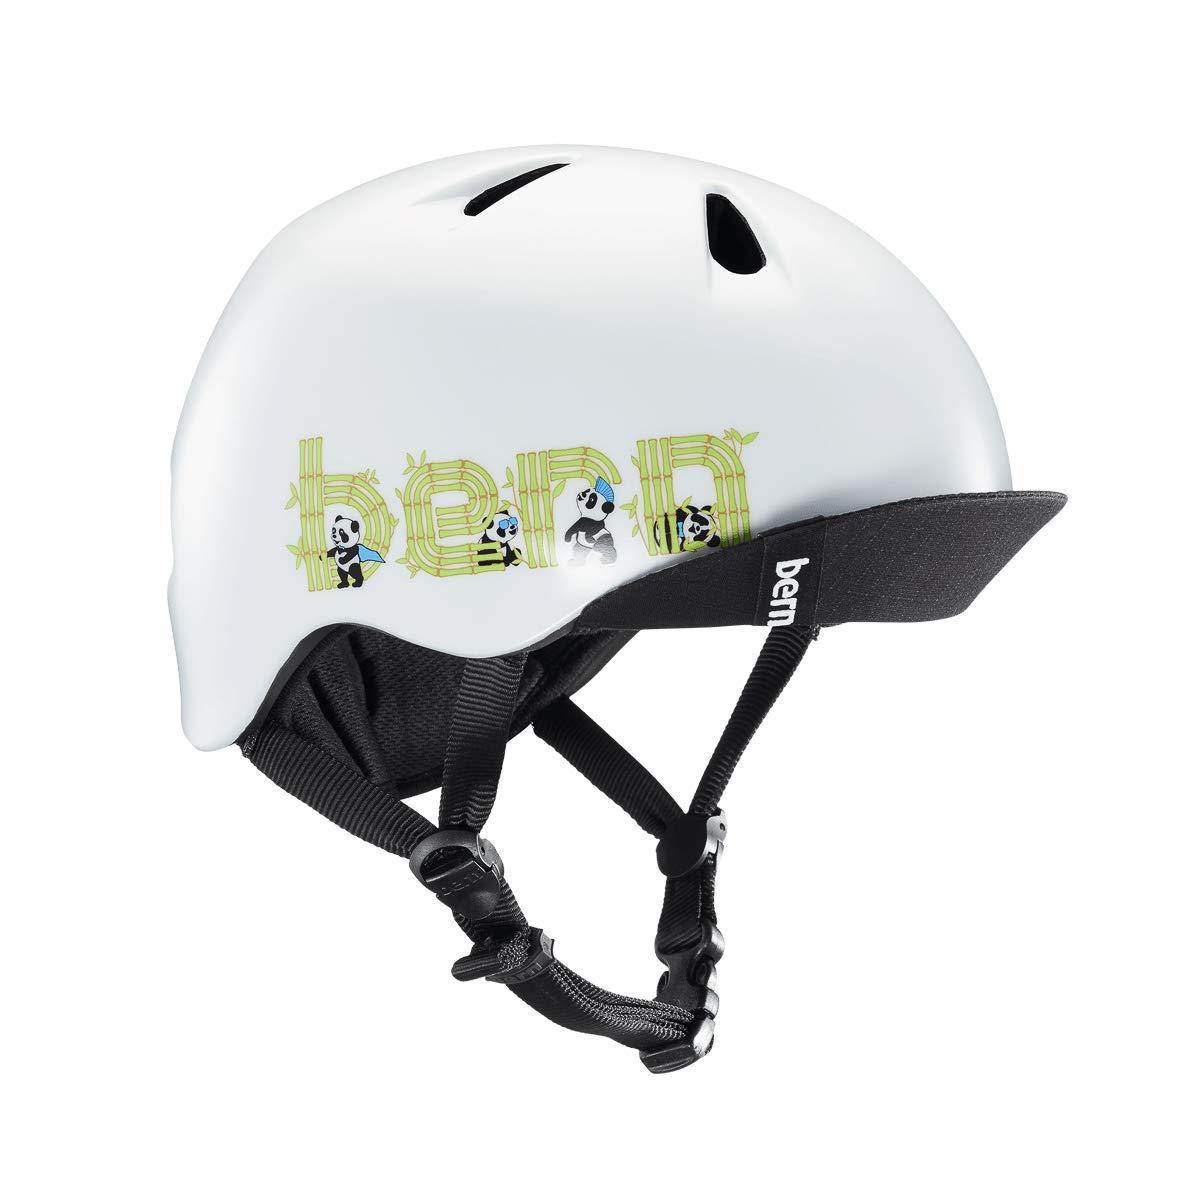 Bern Unlimited Nino Helmet w/ Flip Visor (Satin White Panda Logo, Small/Medium)